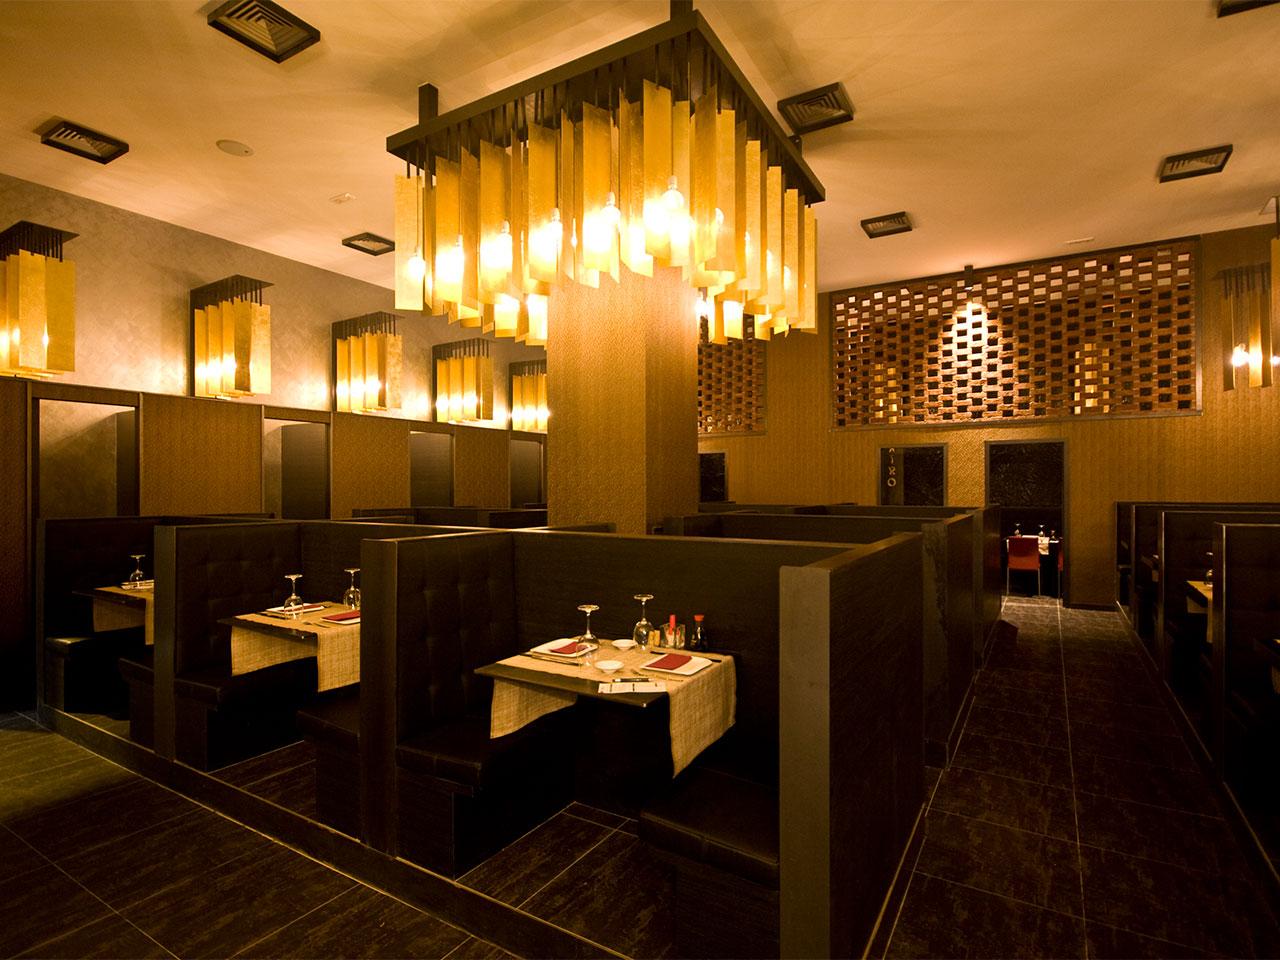 ristorante-giapponese-hiro-japanese-restaurant-gallarate-12